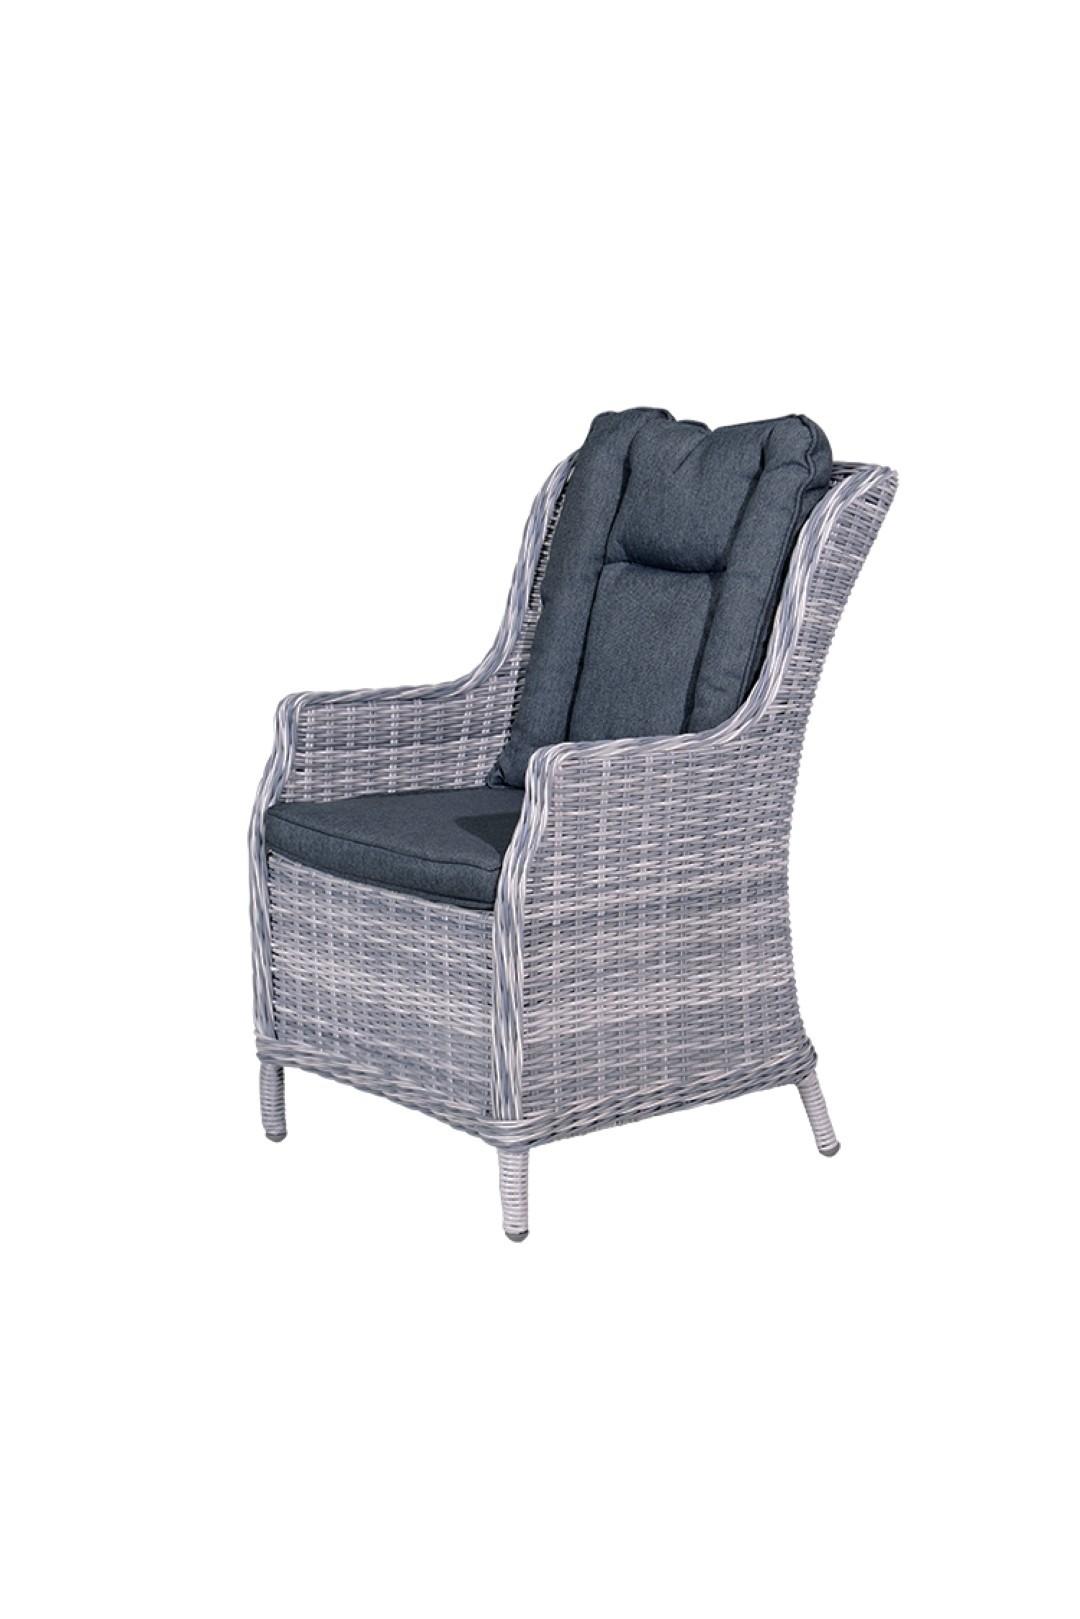 Osborne dining fauteuil cloudy grey 5 mm reflex black